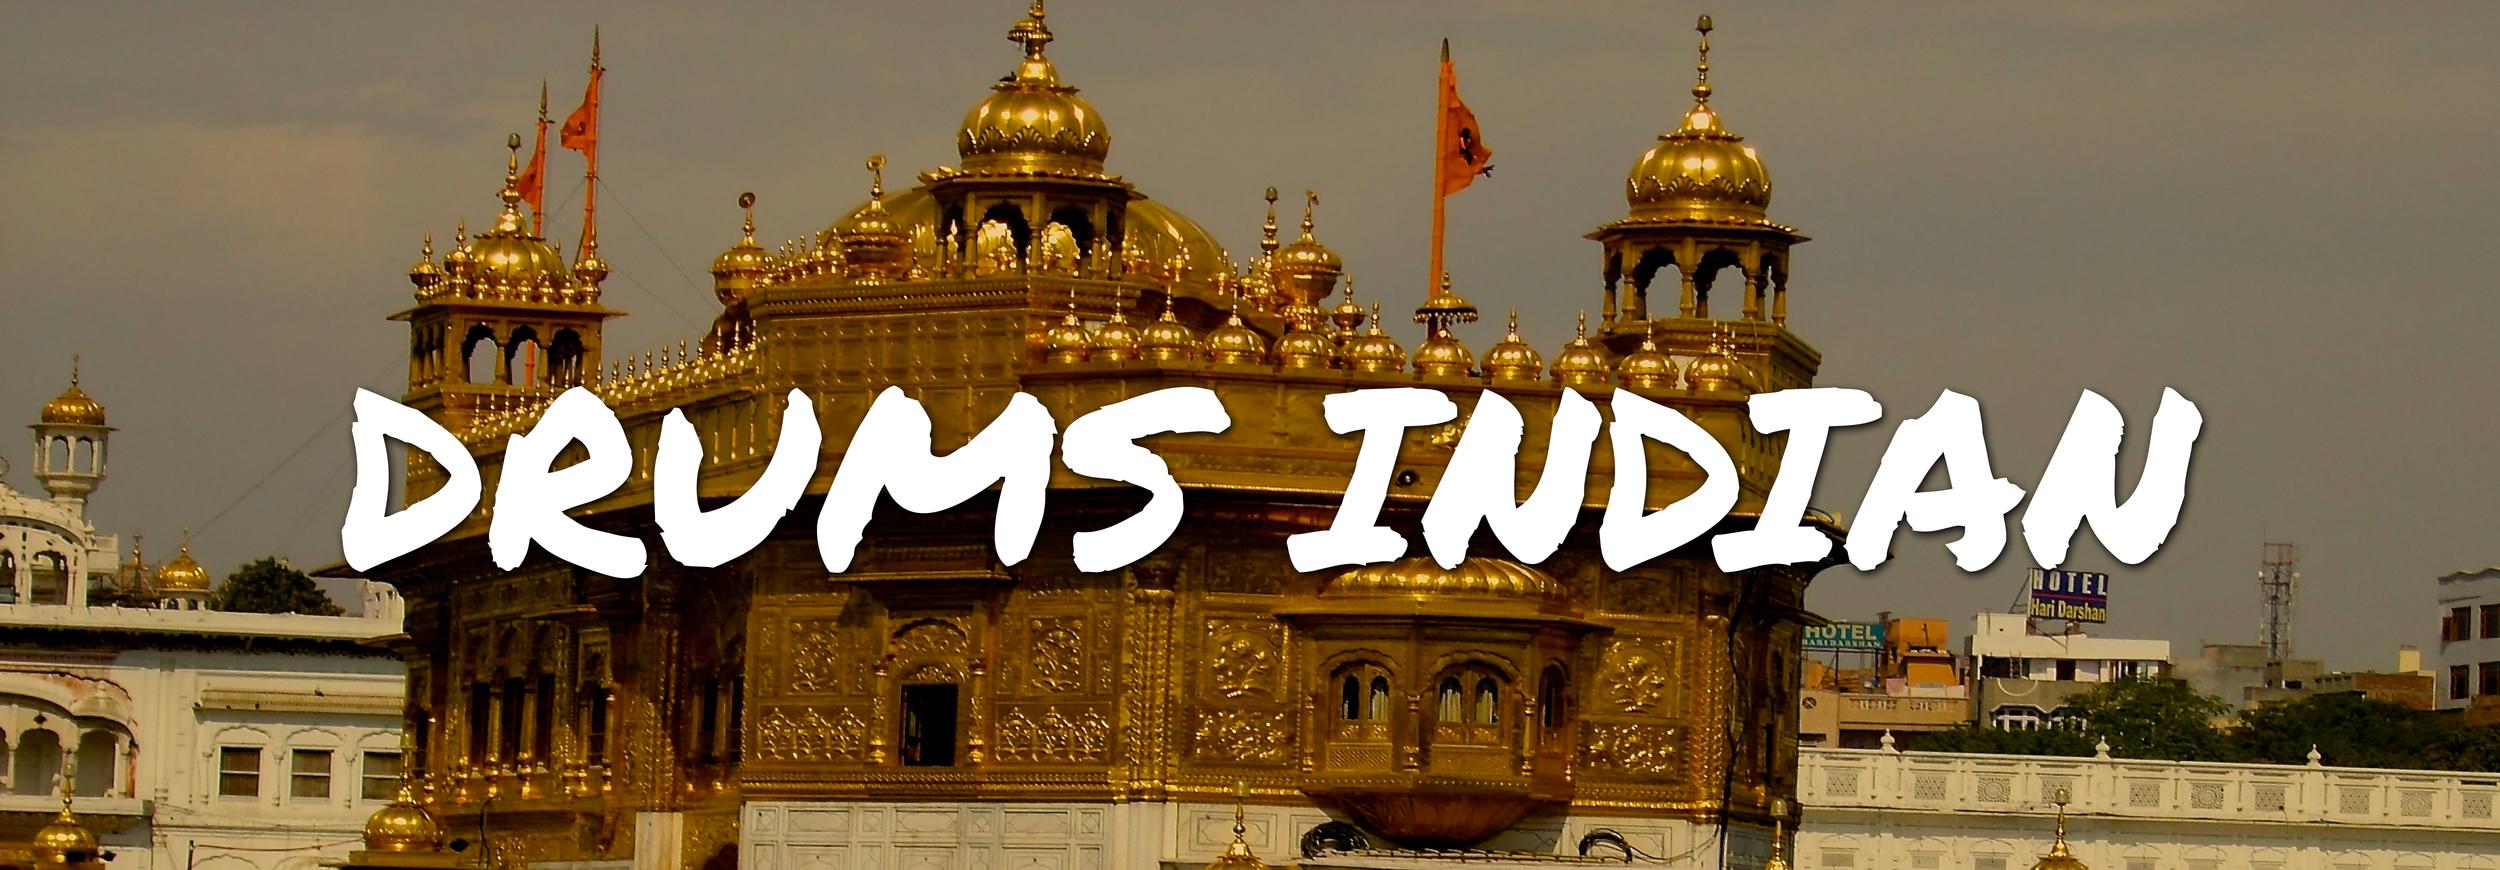 Drums Indian Banner.jpg